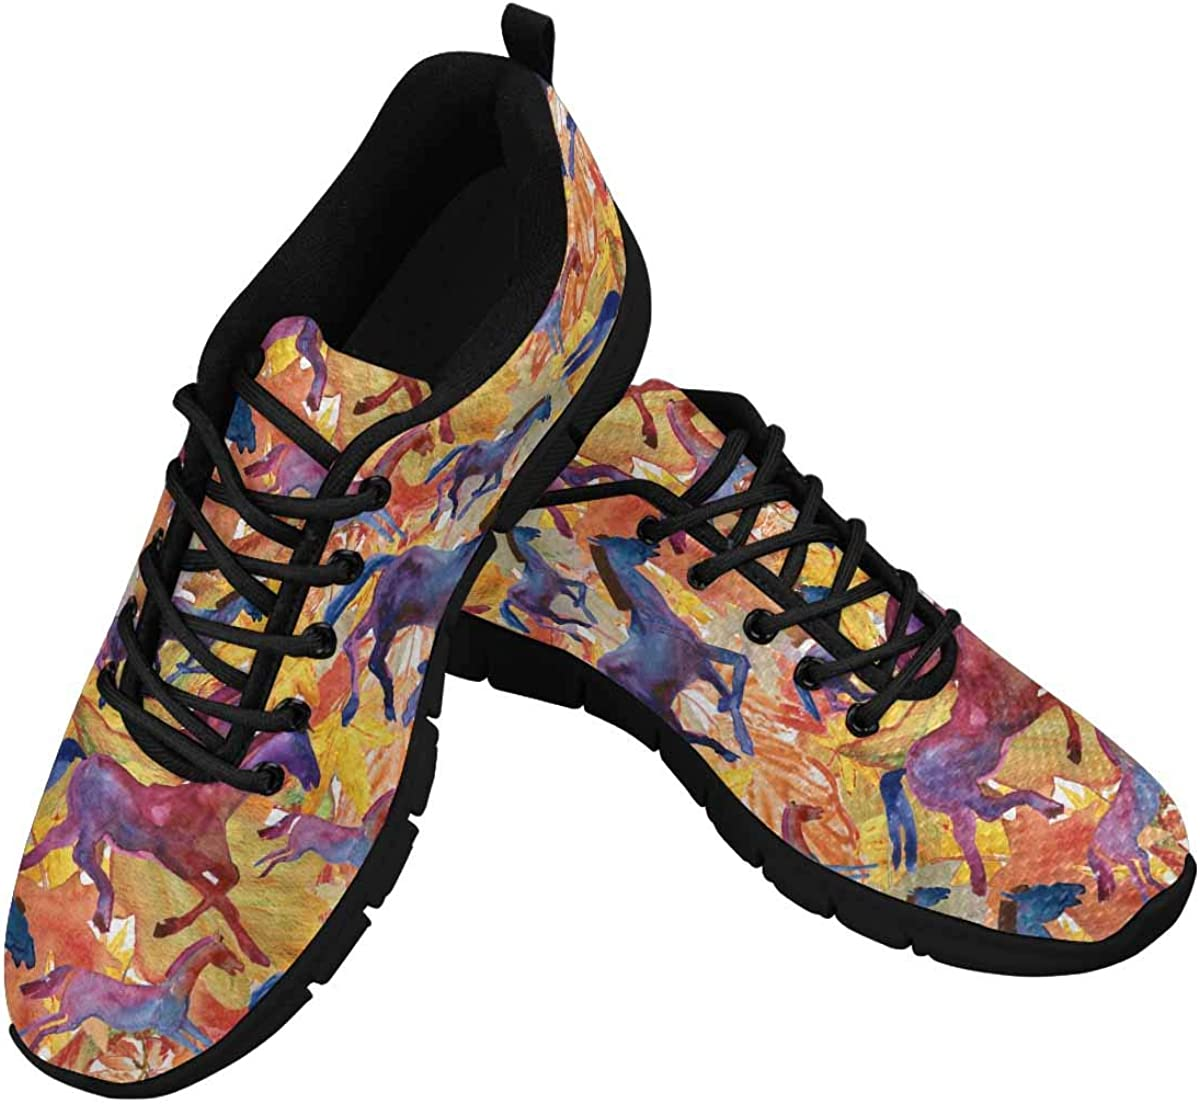 INTERESTPRINT Running Horses Women's Lace Up Running Comfort Sports Sneakers